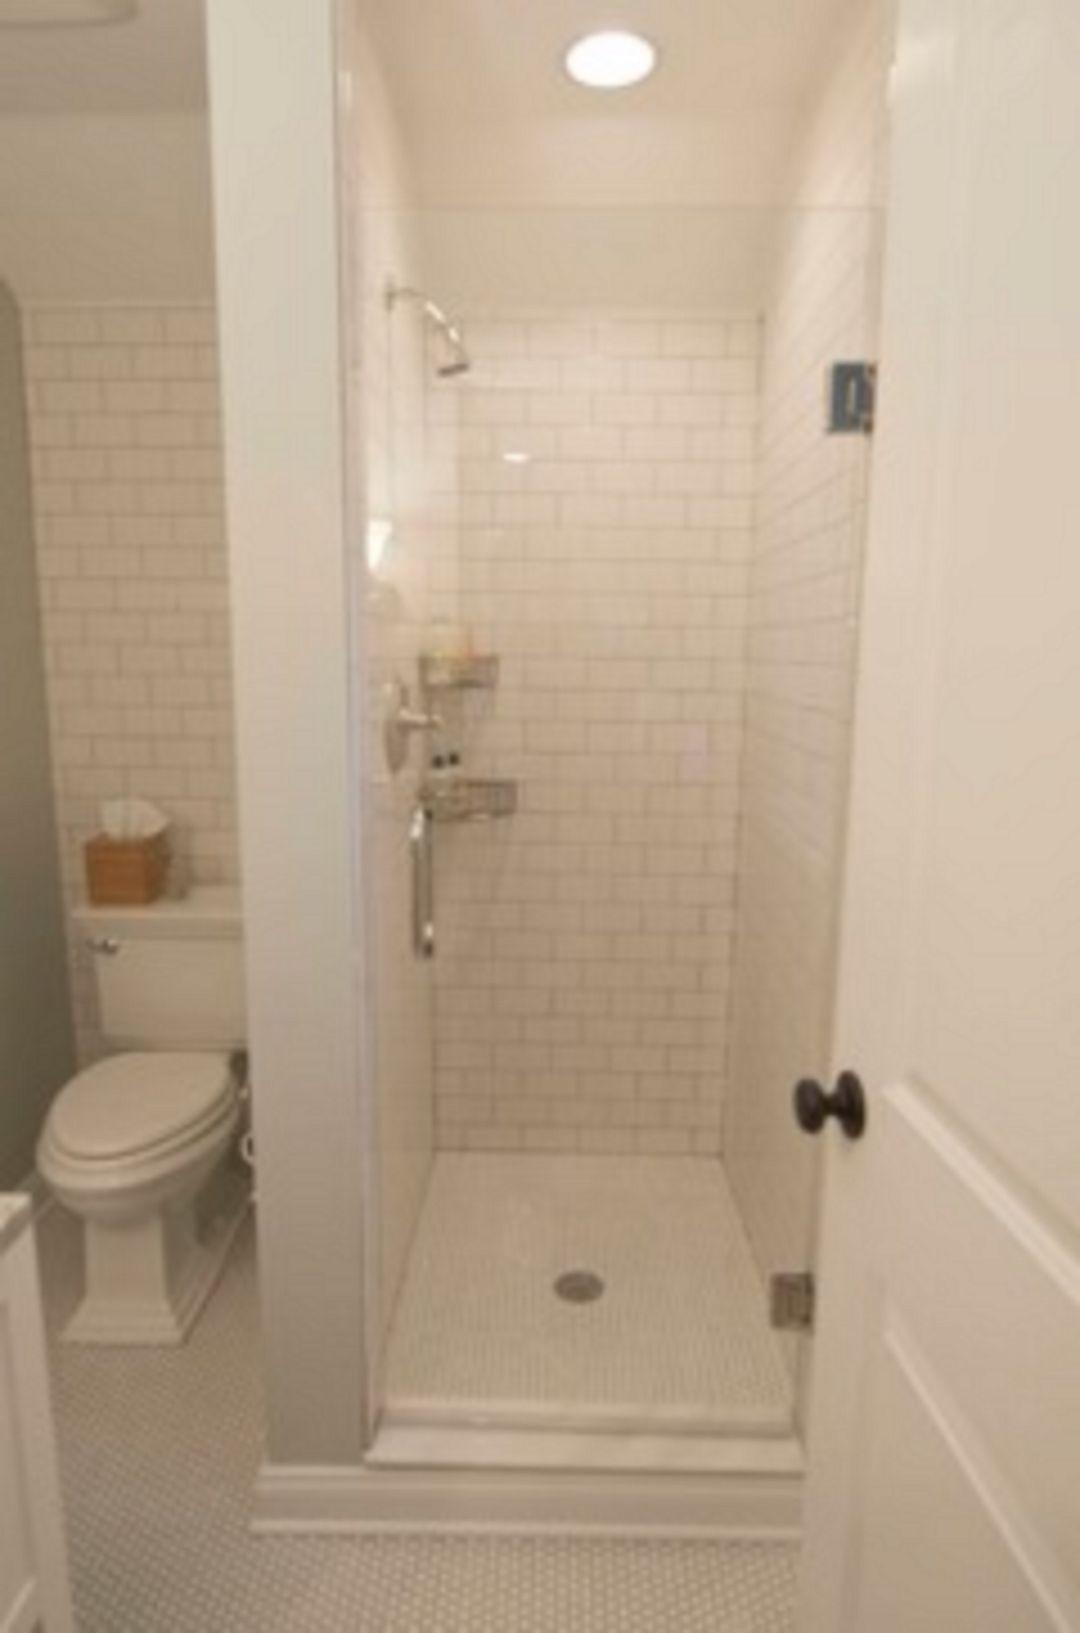 extraordinary bathroom design tile showers ideas | Extraordinary Bathroom Shower Ideas for Small Bathroom 162 ...